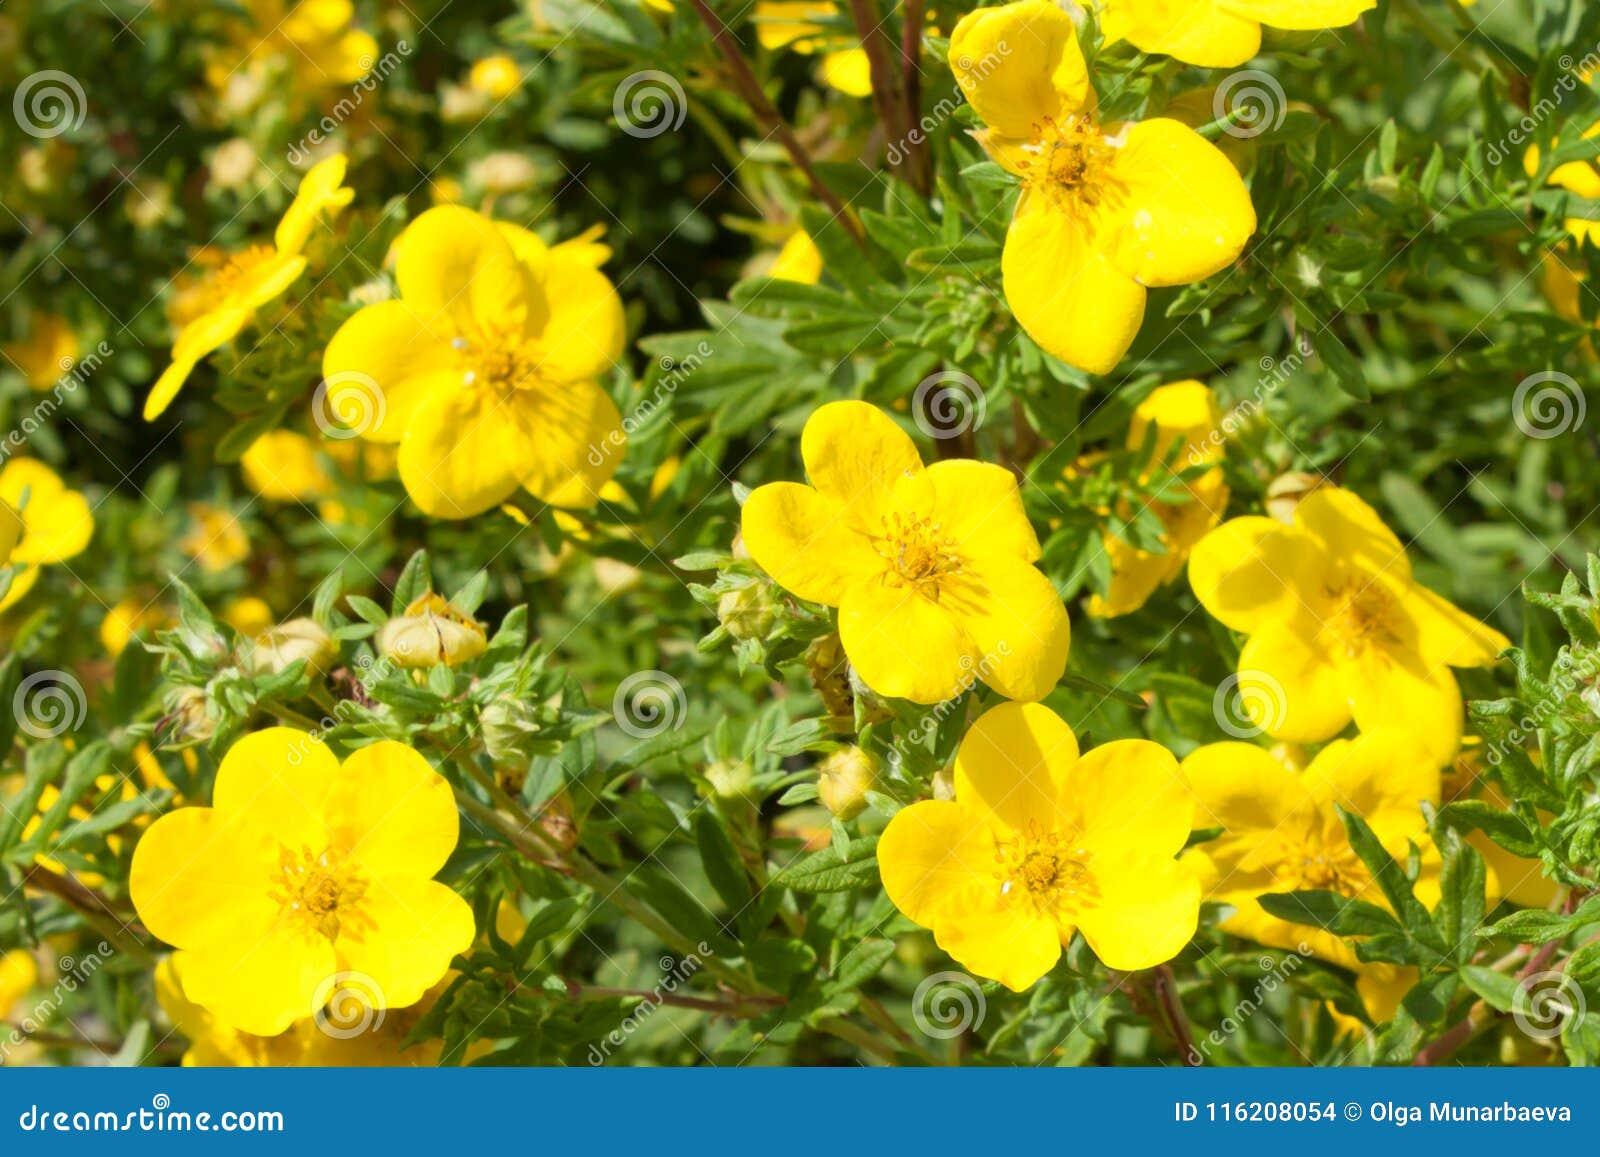 El amarillo florece el goldfinger del fruticosa del potentilla en naturaleza wallpaper